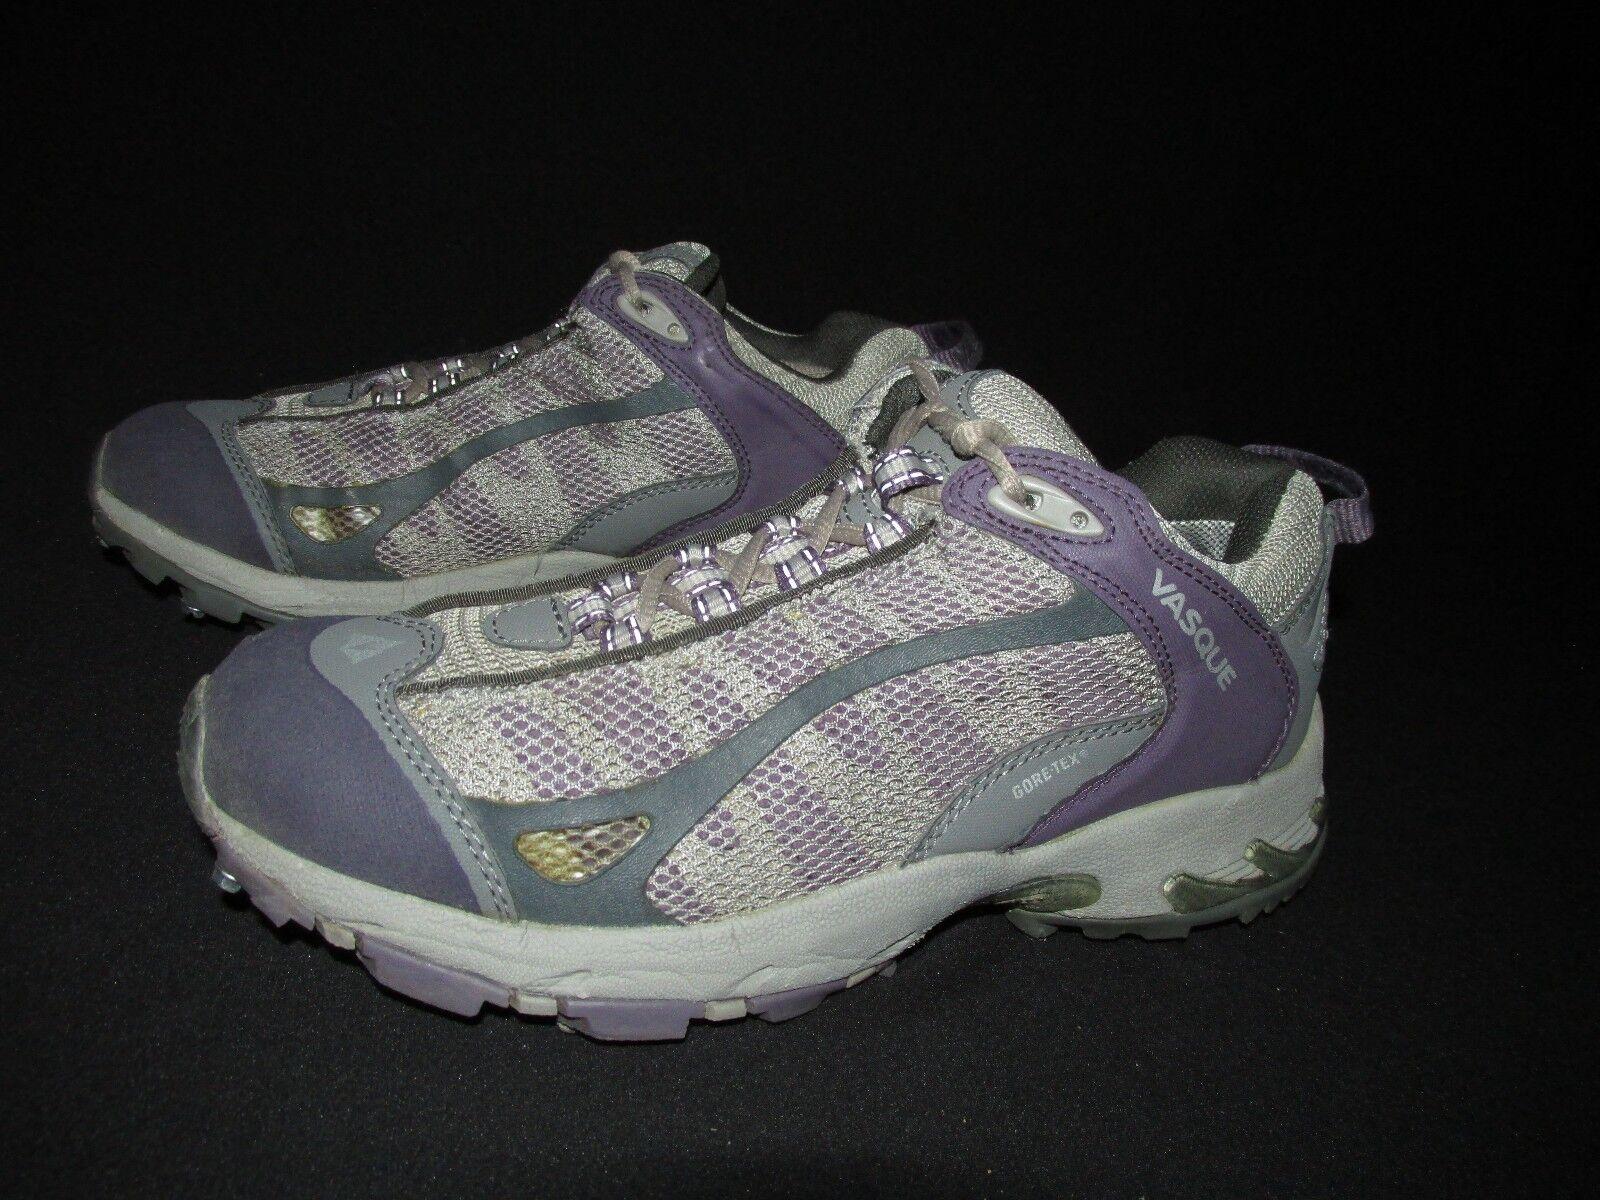 Vasque Gore-Tex Studded Sole Snow Trek Purple Gray Low Boot Shoes Women's US 8M